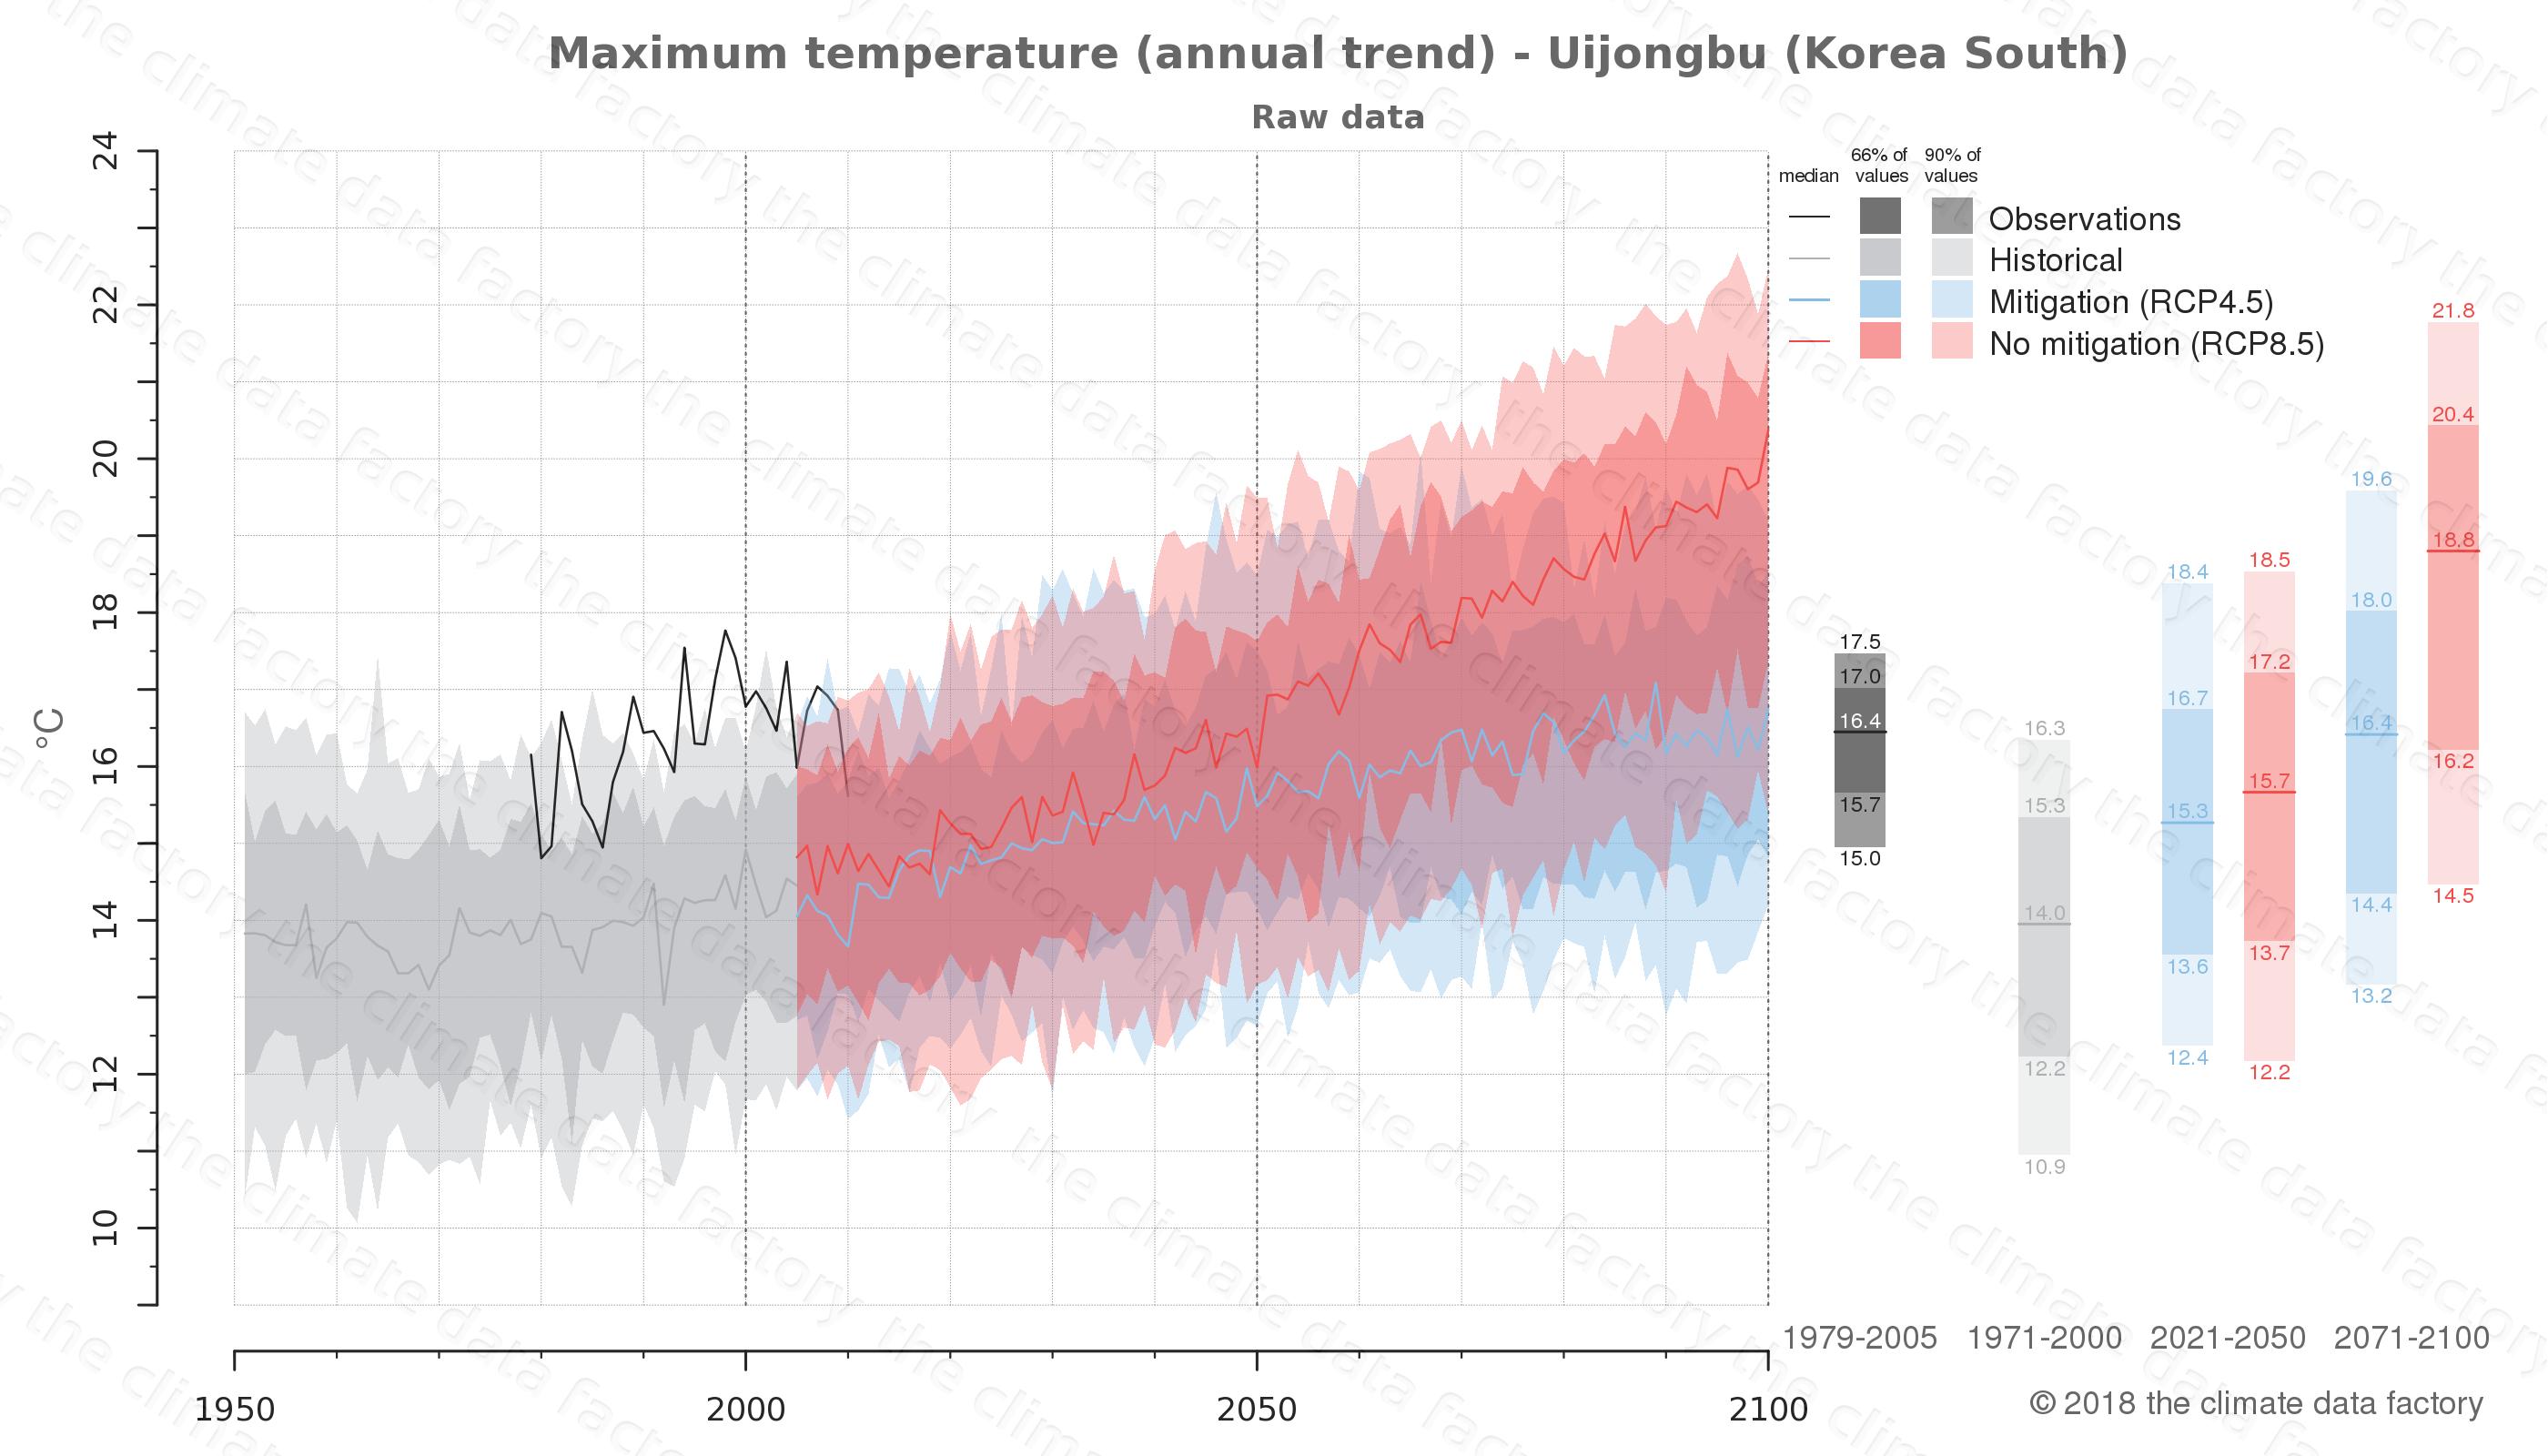 climate change data policy adaptation climate graph city data maximum-temperature uijongbu south korea